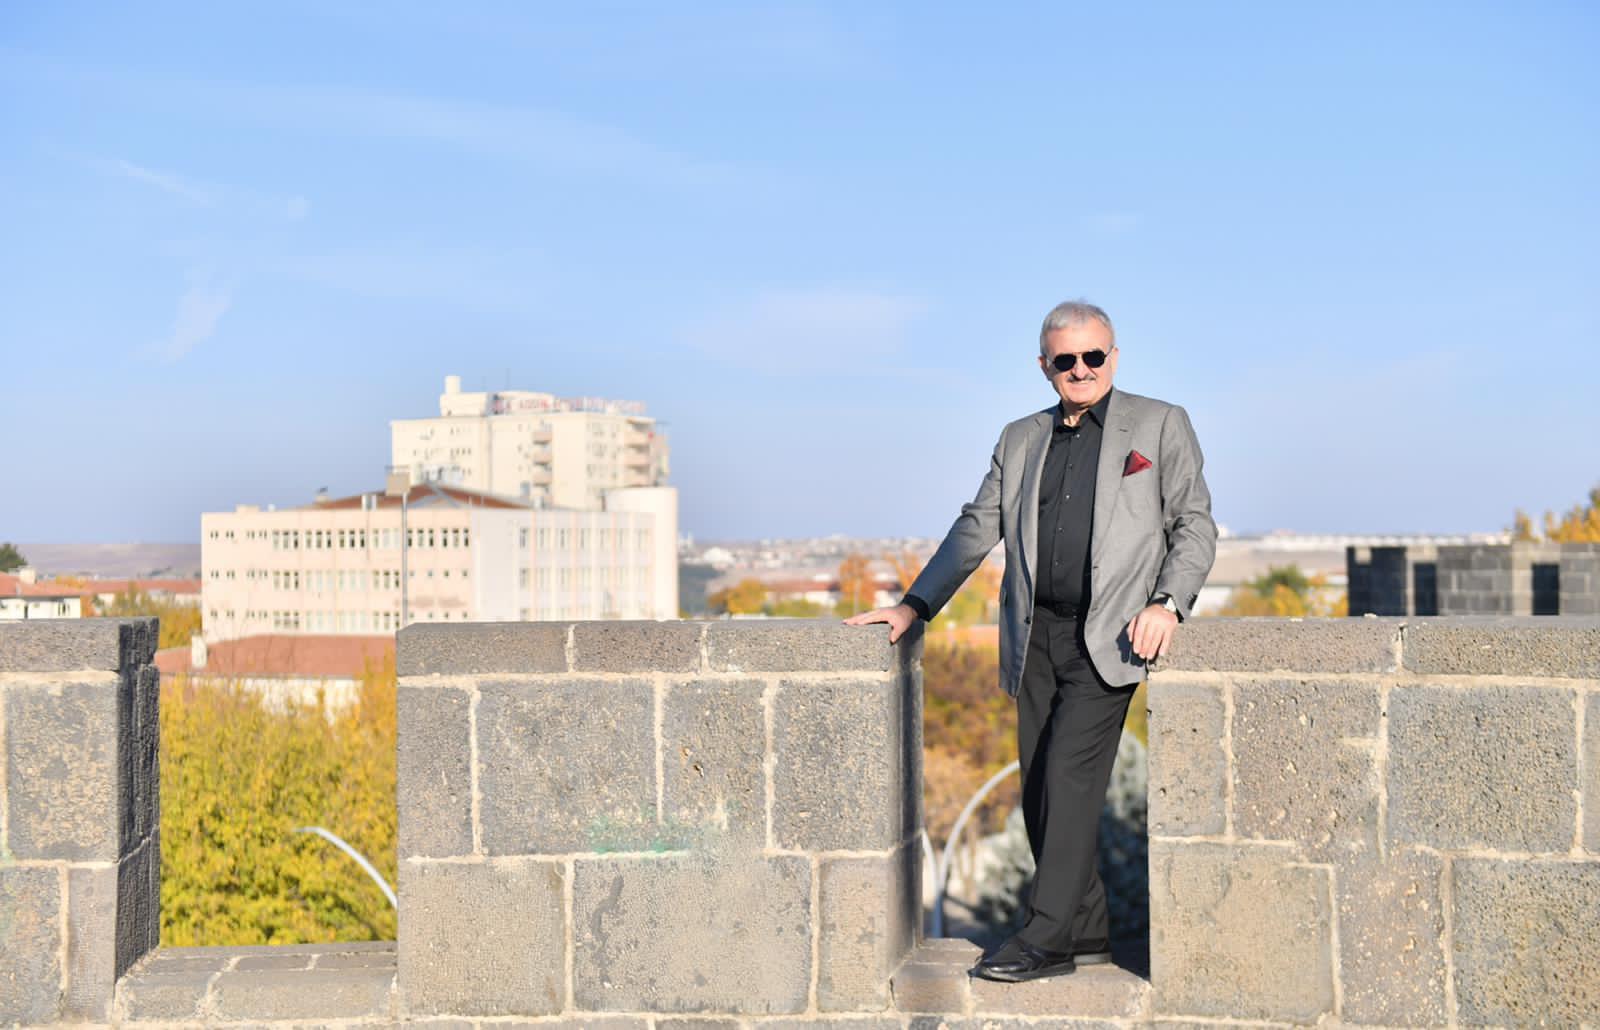 Diyarbakır Valisi Surlara çıktı